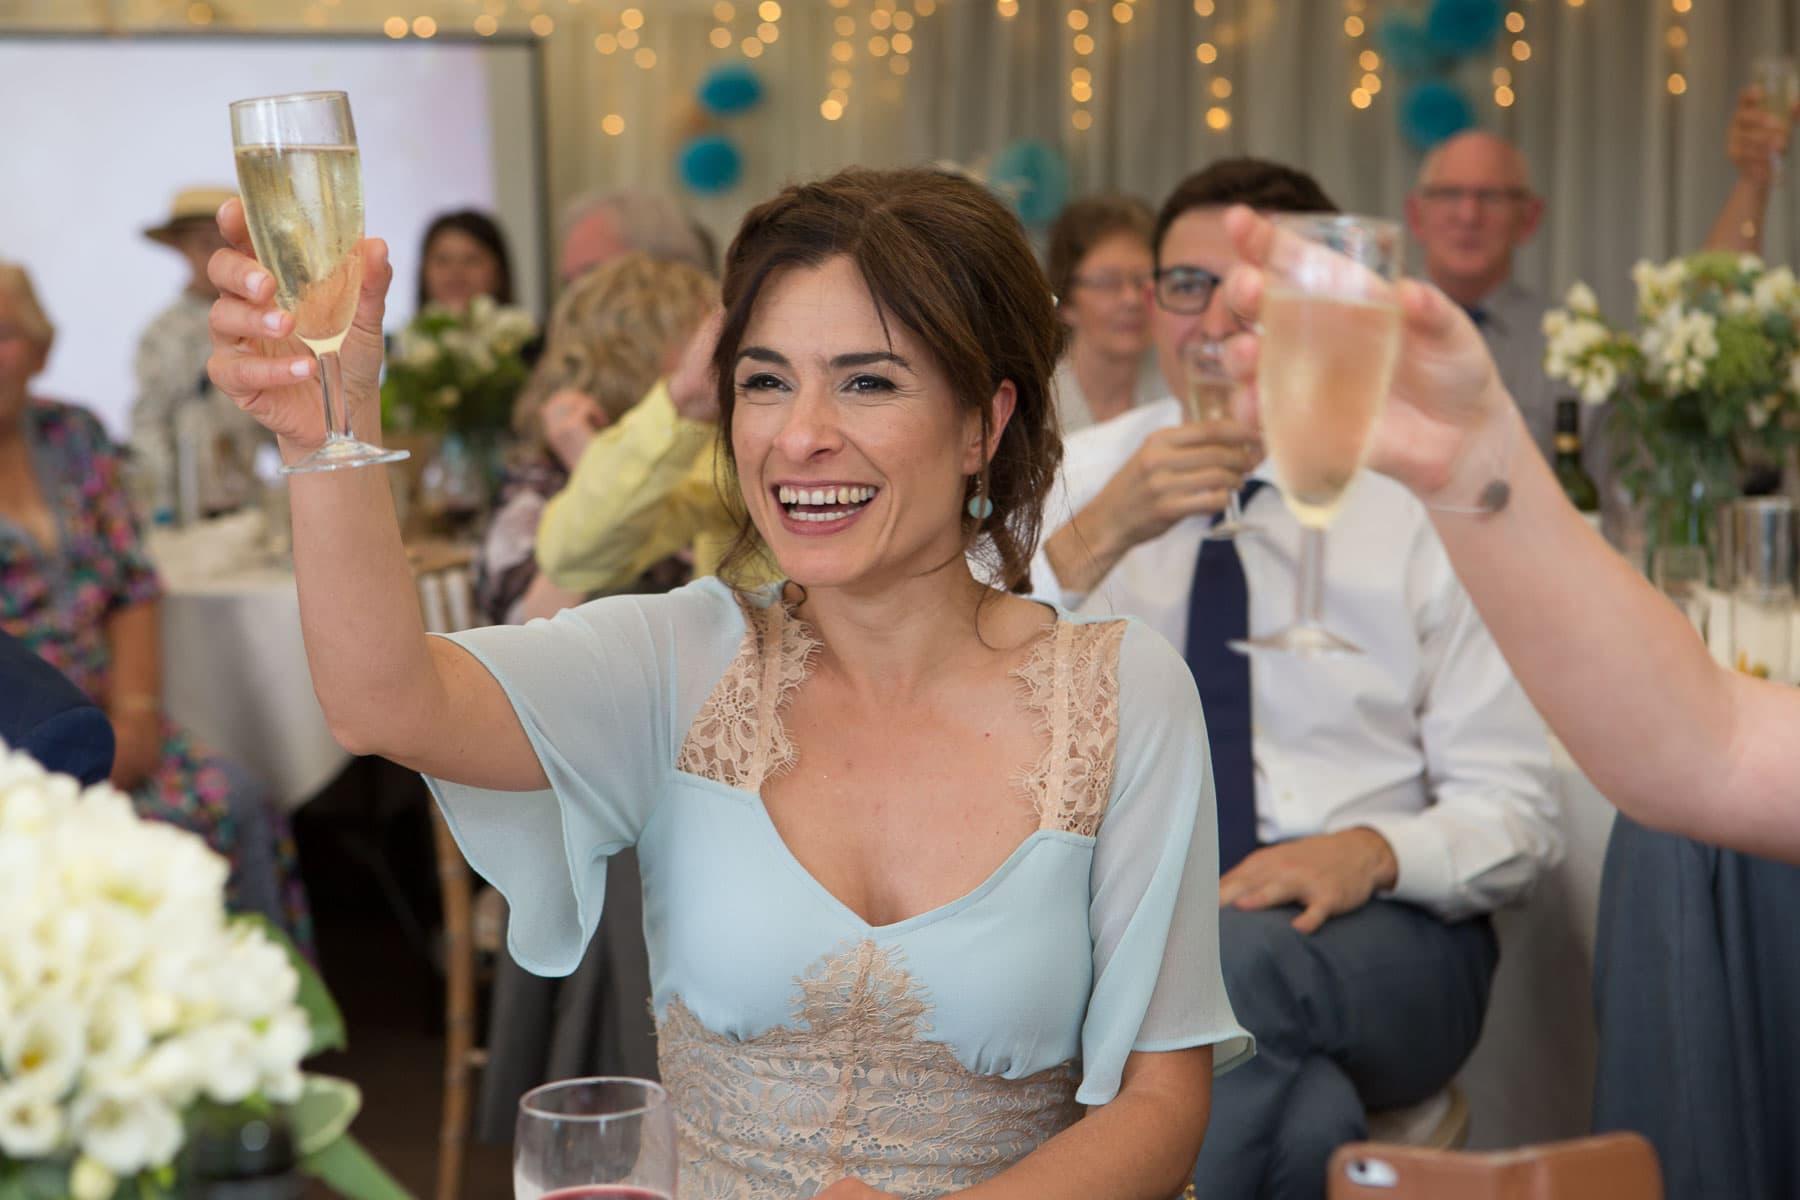 Bridesmaid raises her glass during speeches